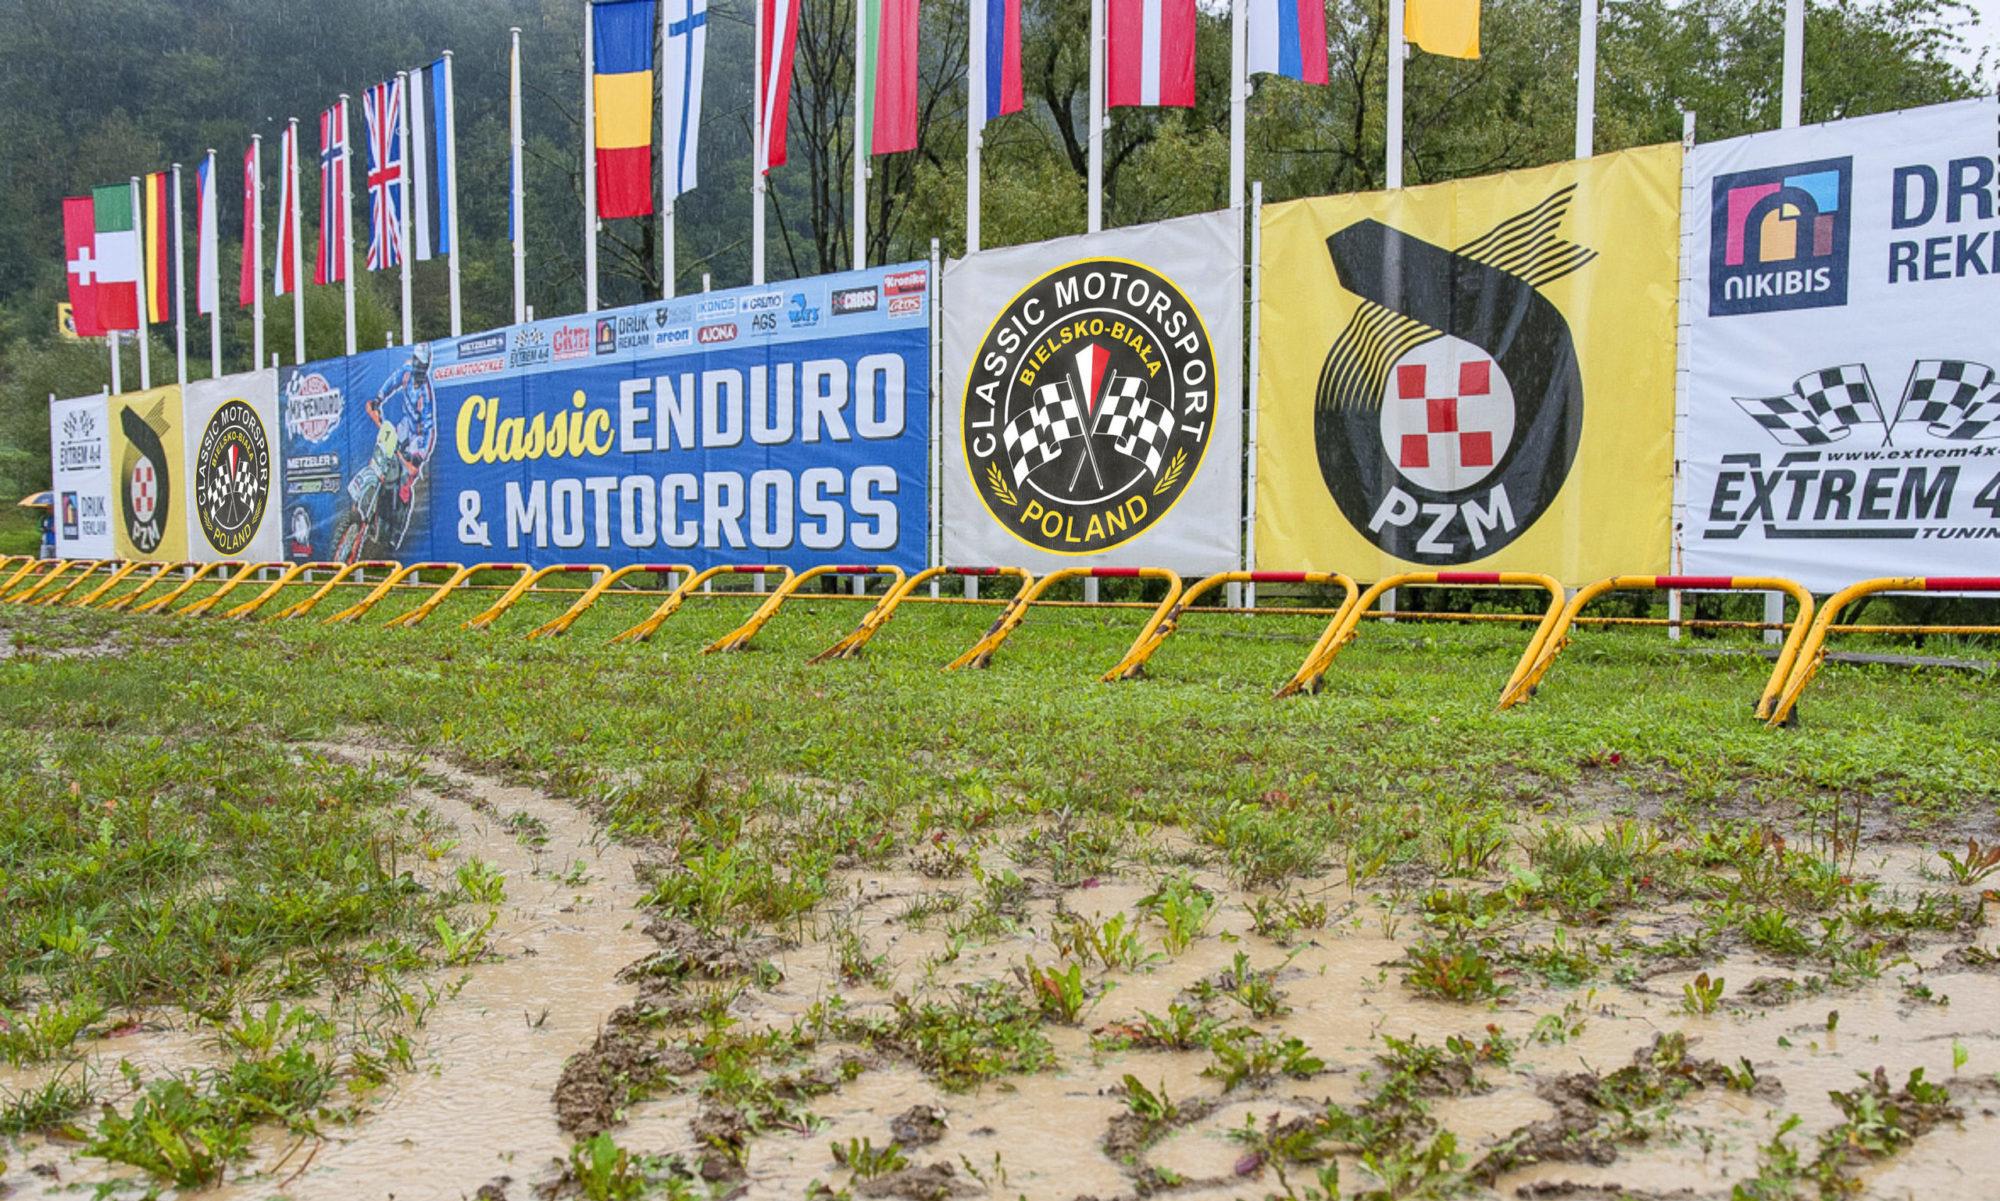 Classic Motorsport Bielsko-Biała